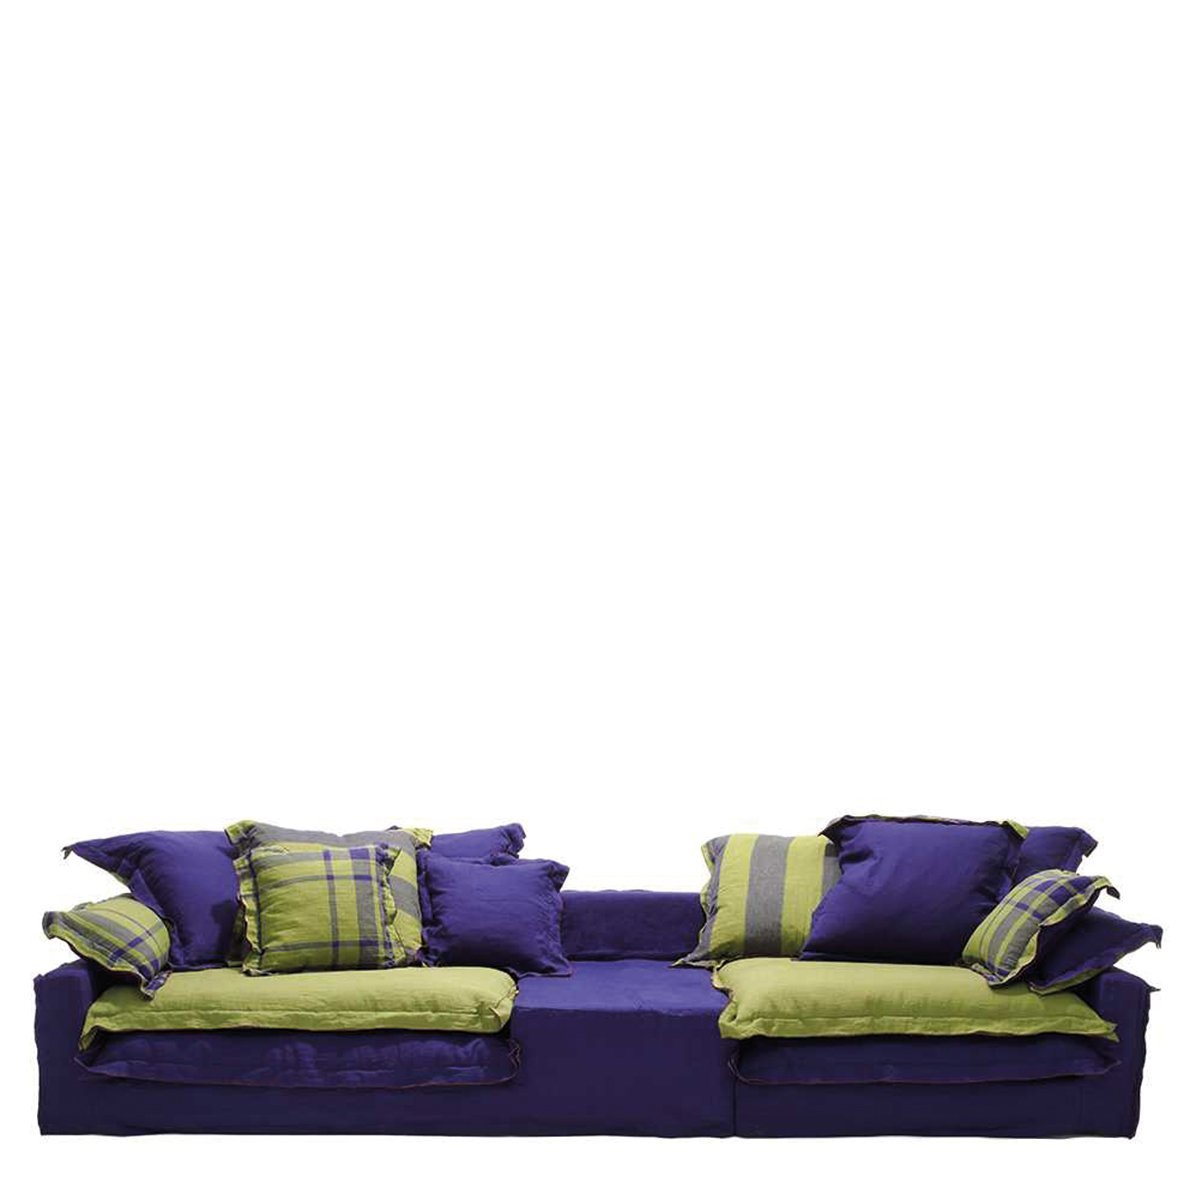 Linteloo Jans New Elements Sofa Bank